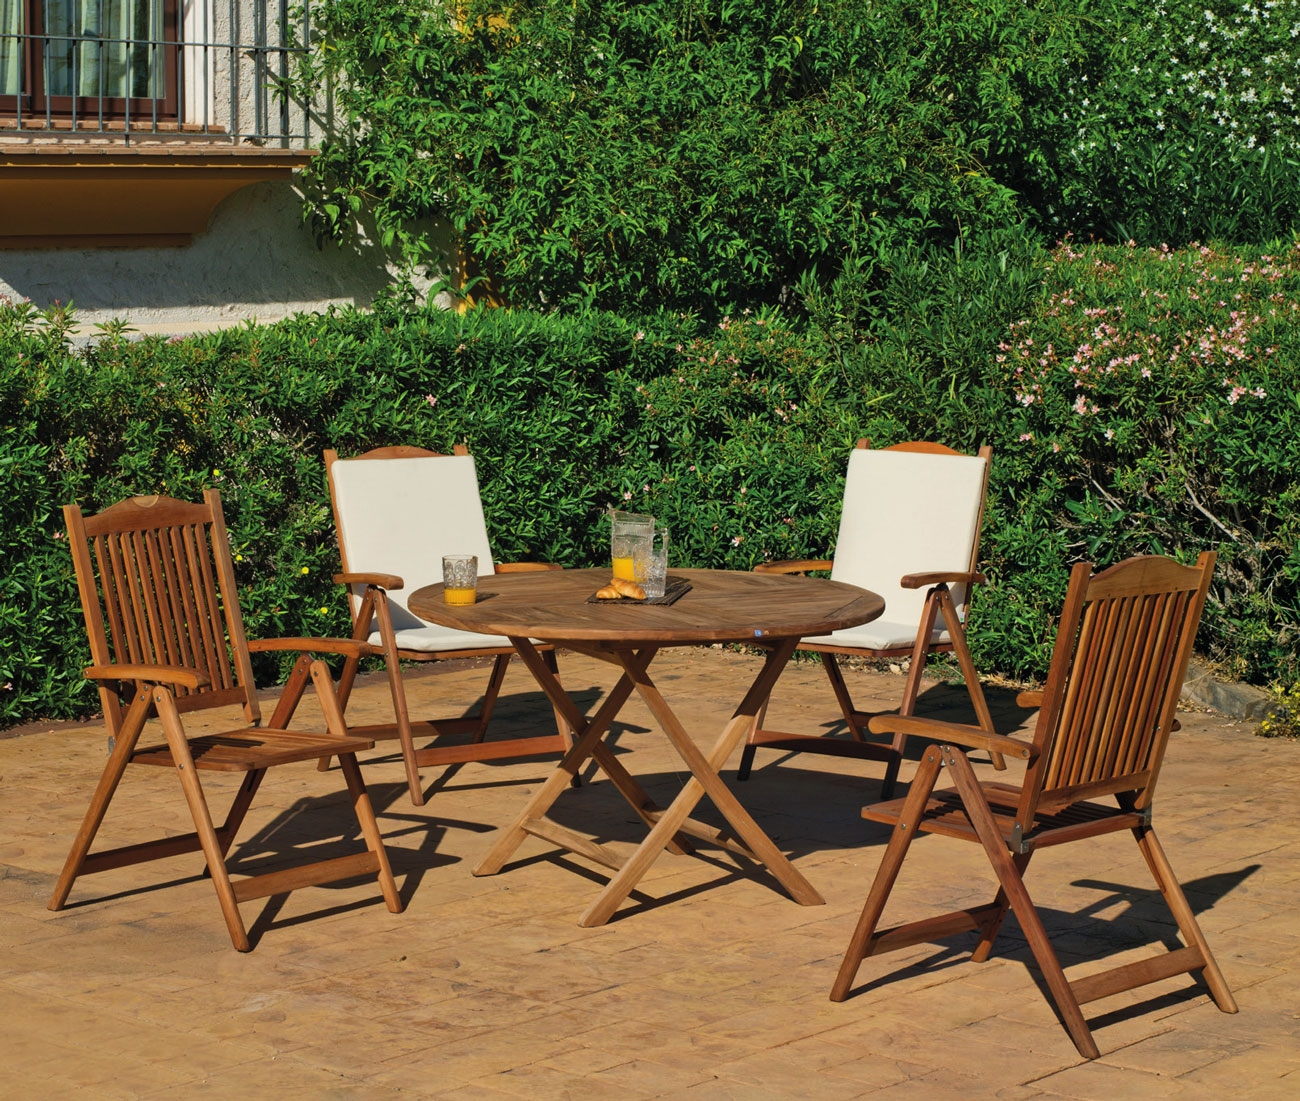 Set sillas y mesa madera King Seroni 120